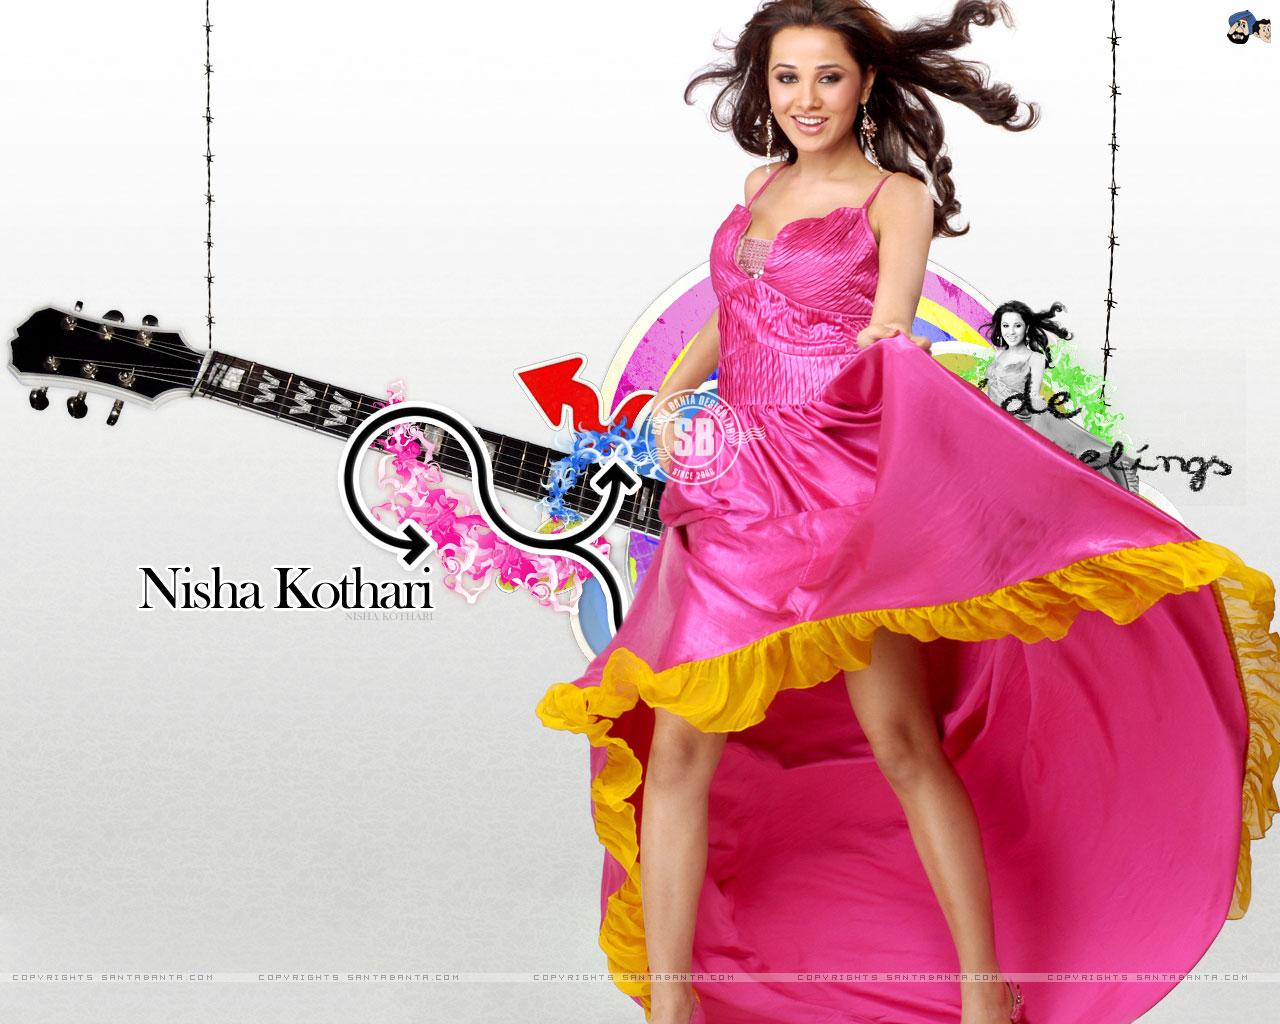 Картинка Nisha Kothari Индийские Знаменитости Ниша Котхари